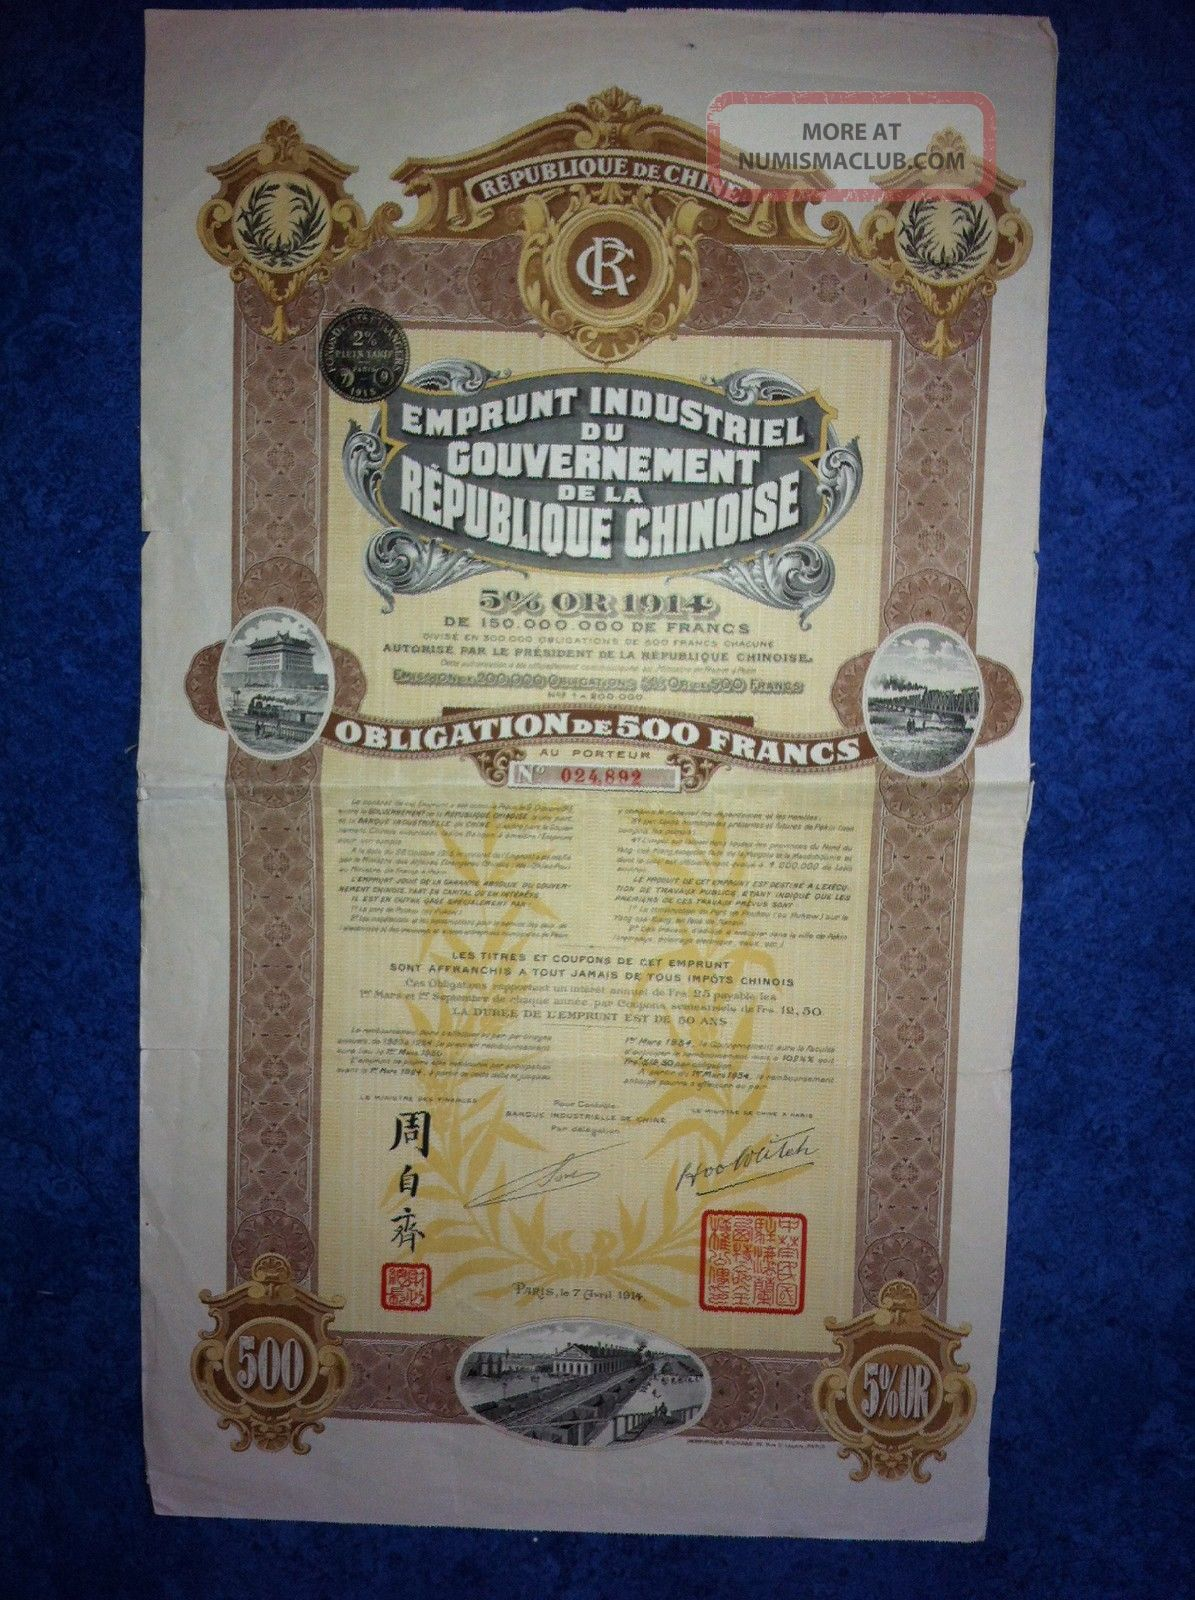 Chinese Gold Bond 1914 Emprunt Industriel Republique Chinoise 500 Francs Stocks & Bonds, Scripophily photo